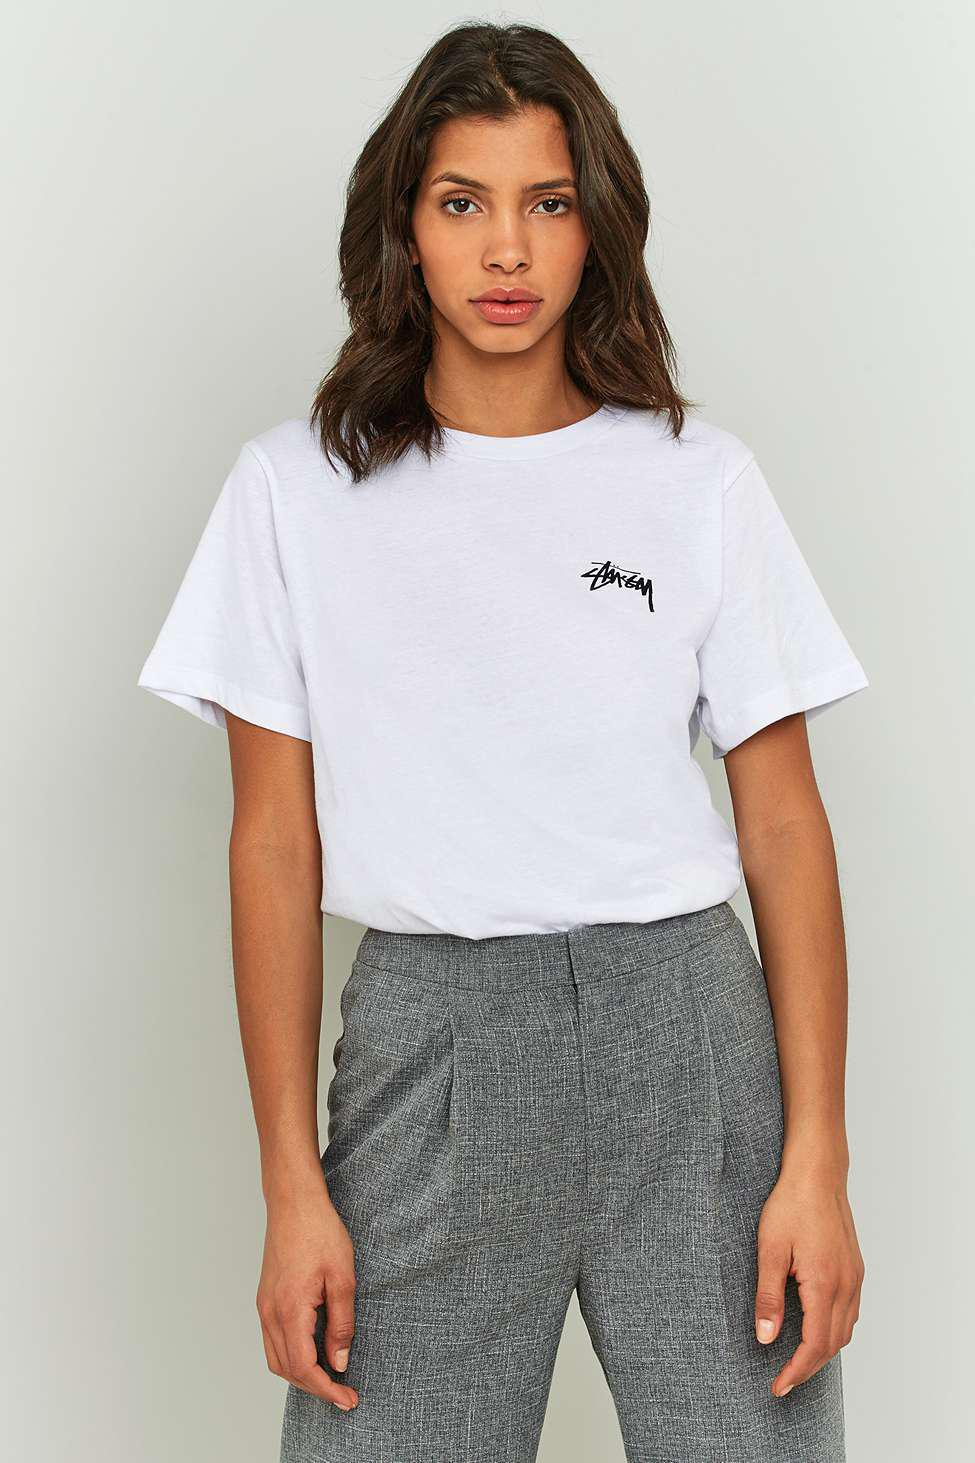 c378fd36 Stussy Eight Ball Boyfriend T-shirt - Womens S in White - Lyst